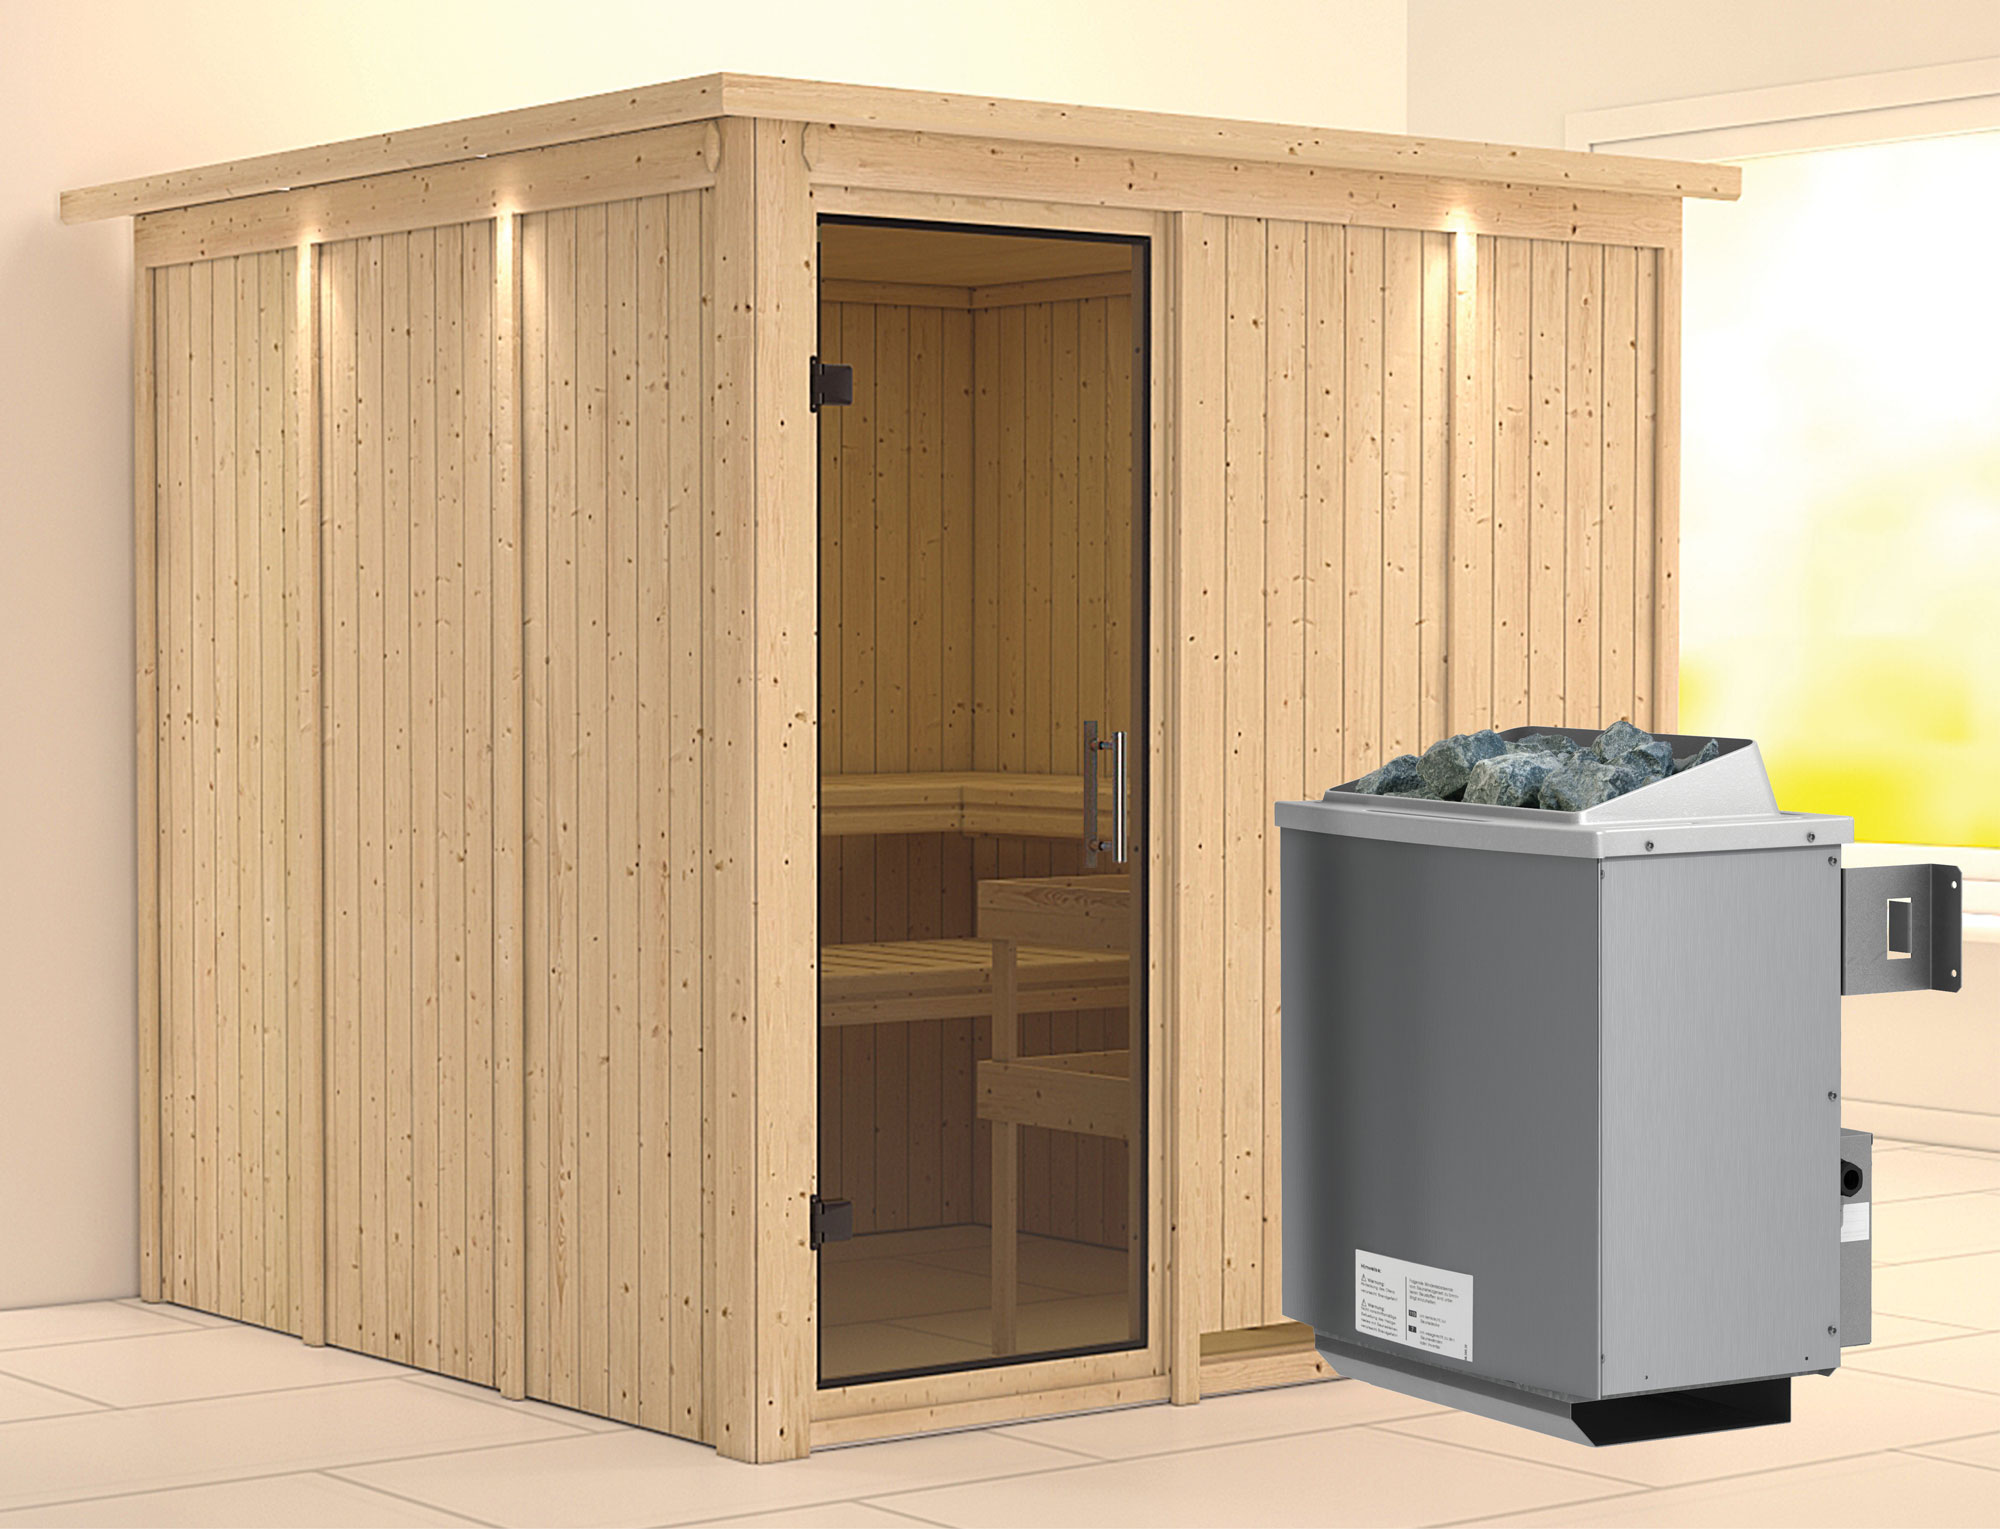 Karibu Sauna Rodin 68mm Dachkranz + Ofen 9kW intern moderne Tür Bild 1